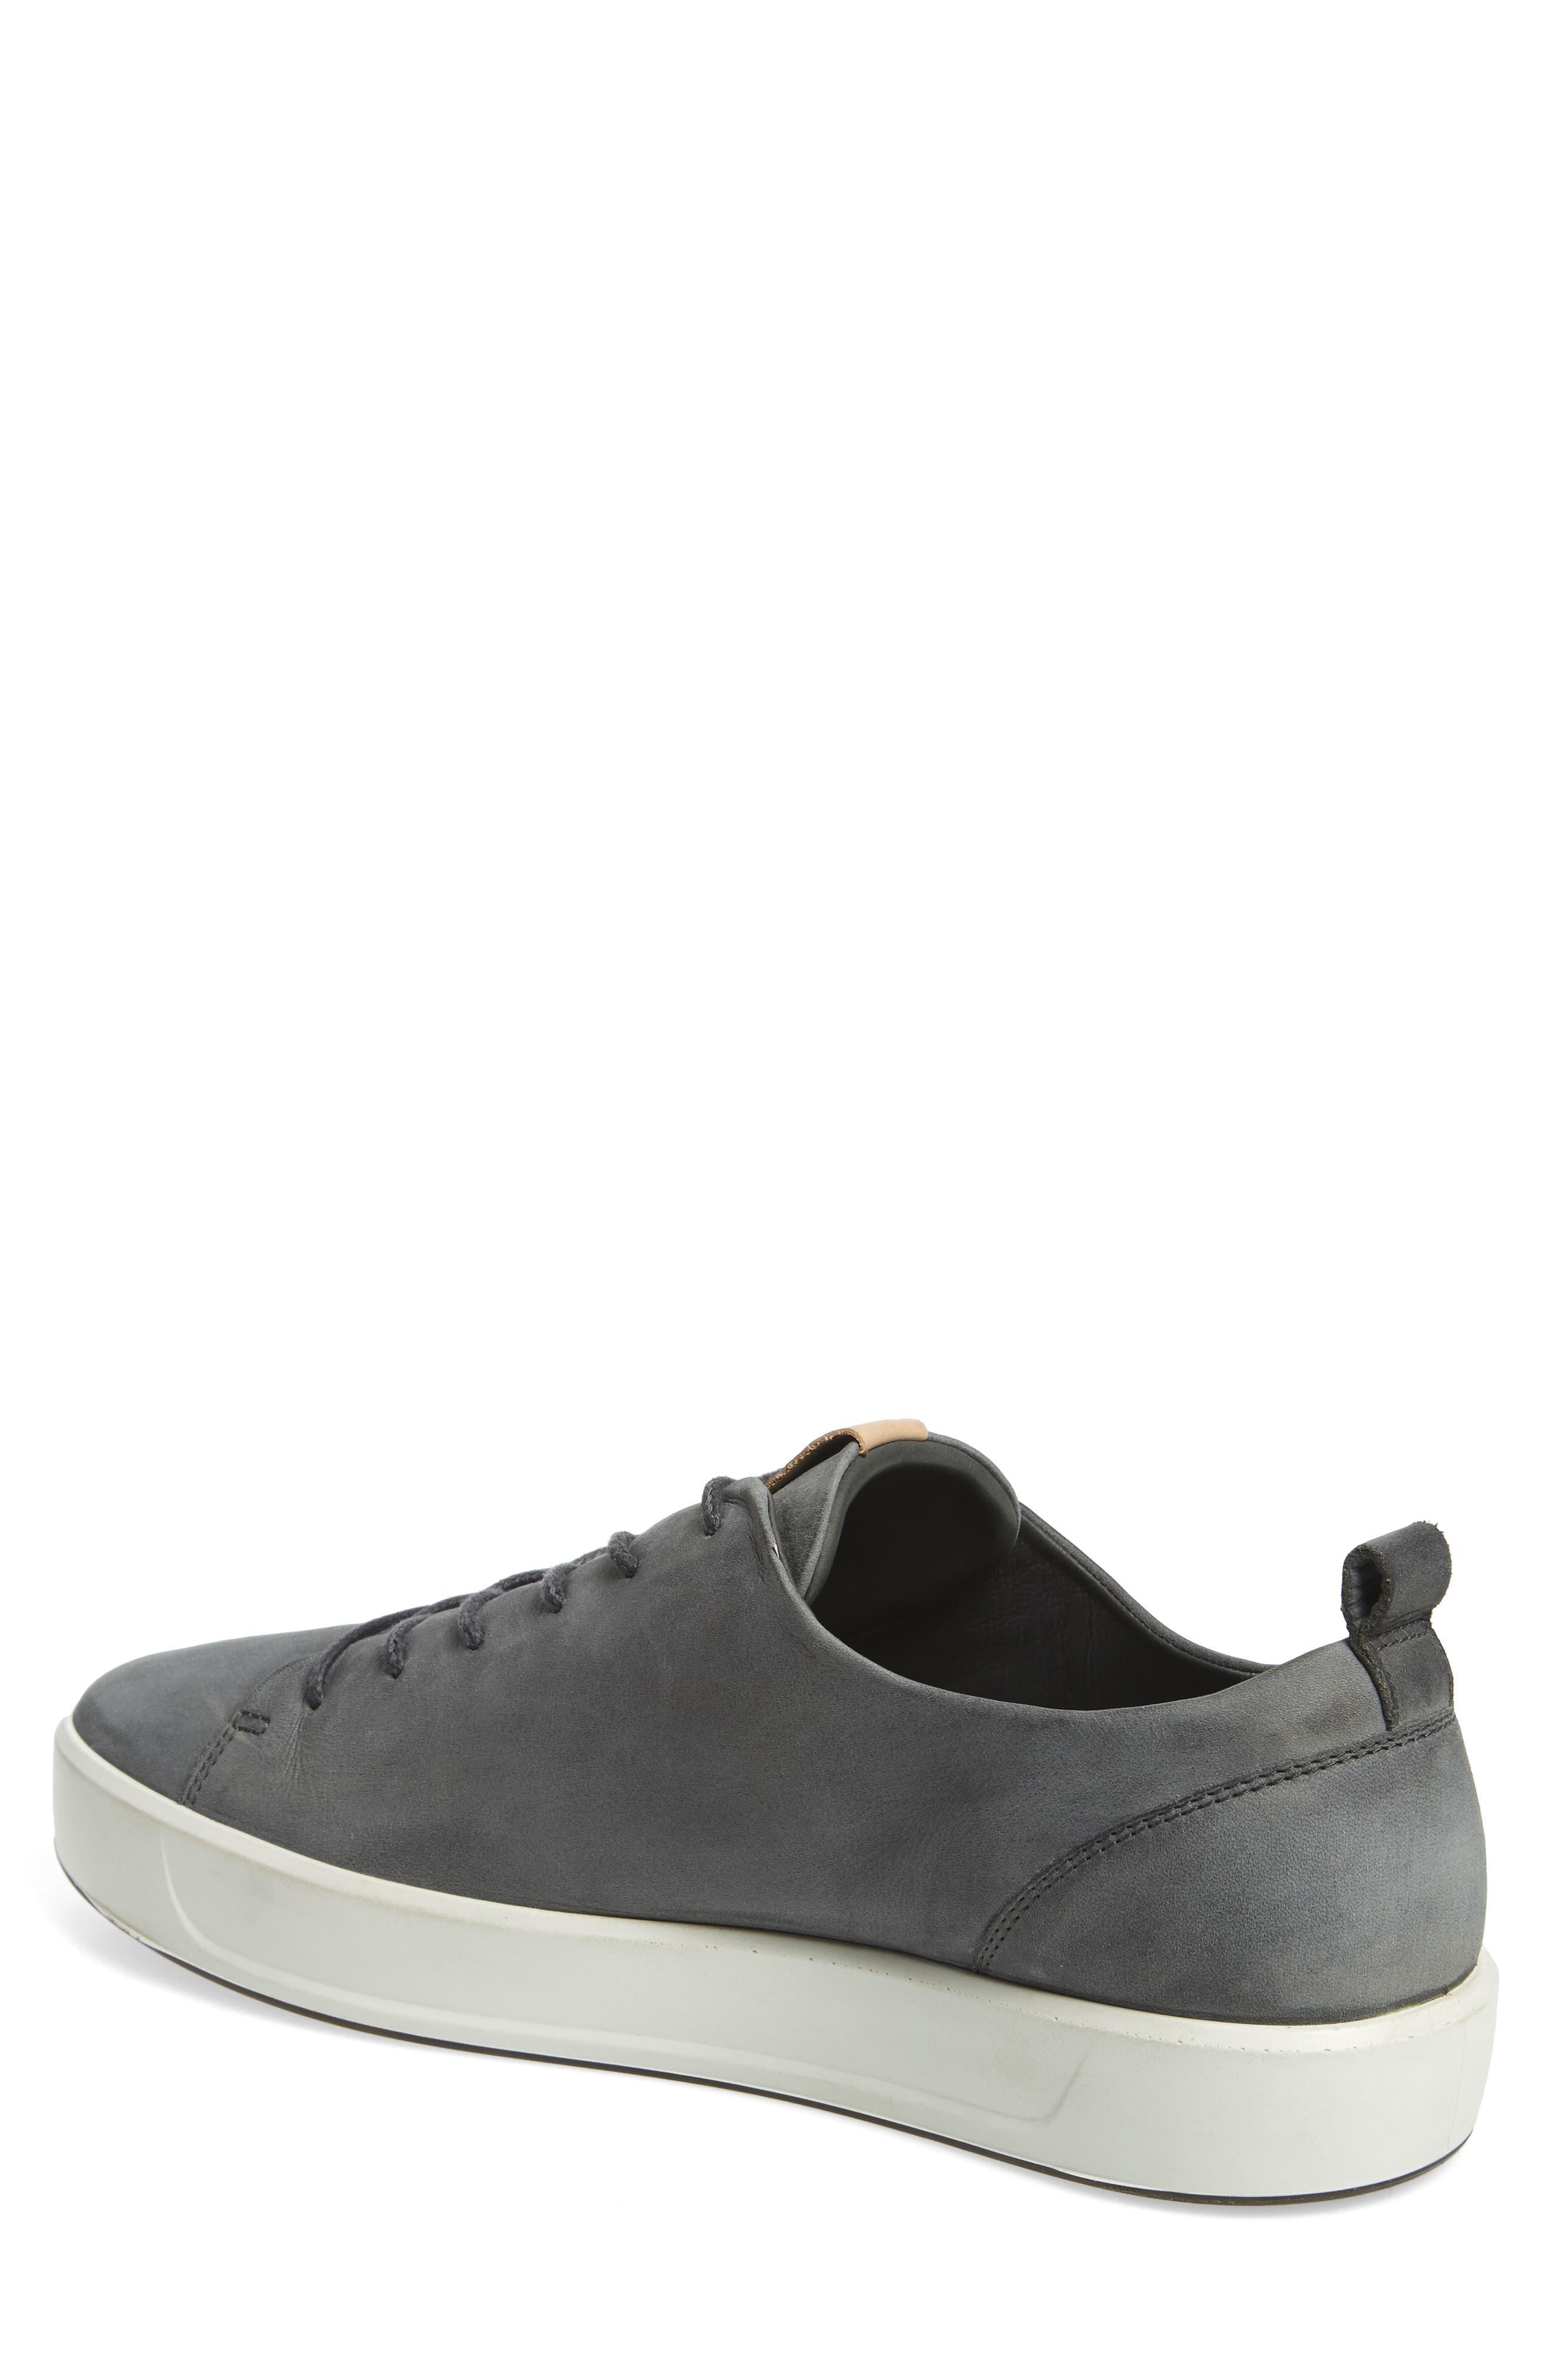 ECCO, Soft 8 Sneaker, Alternate thumbnail 2, color, 025